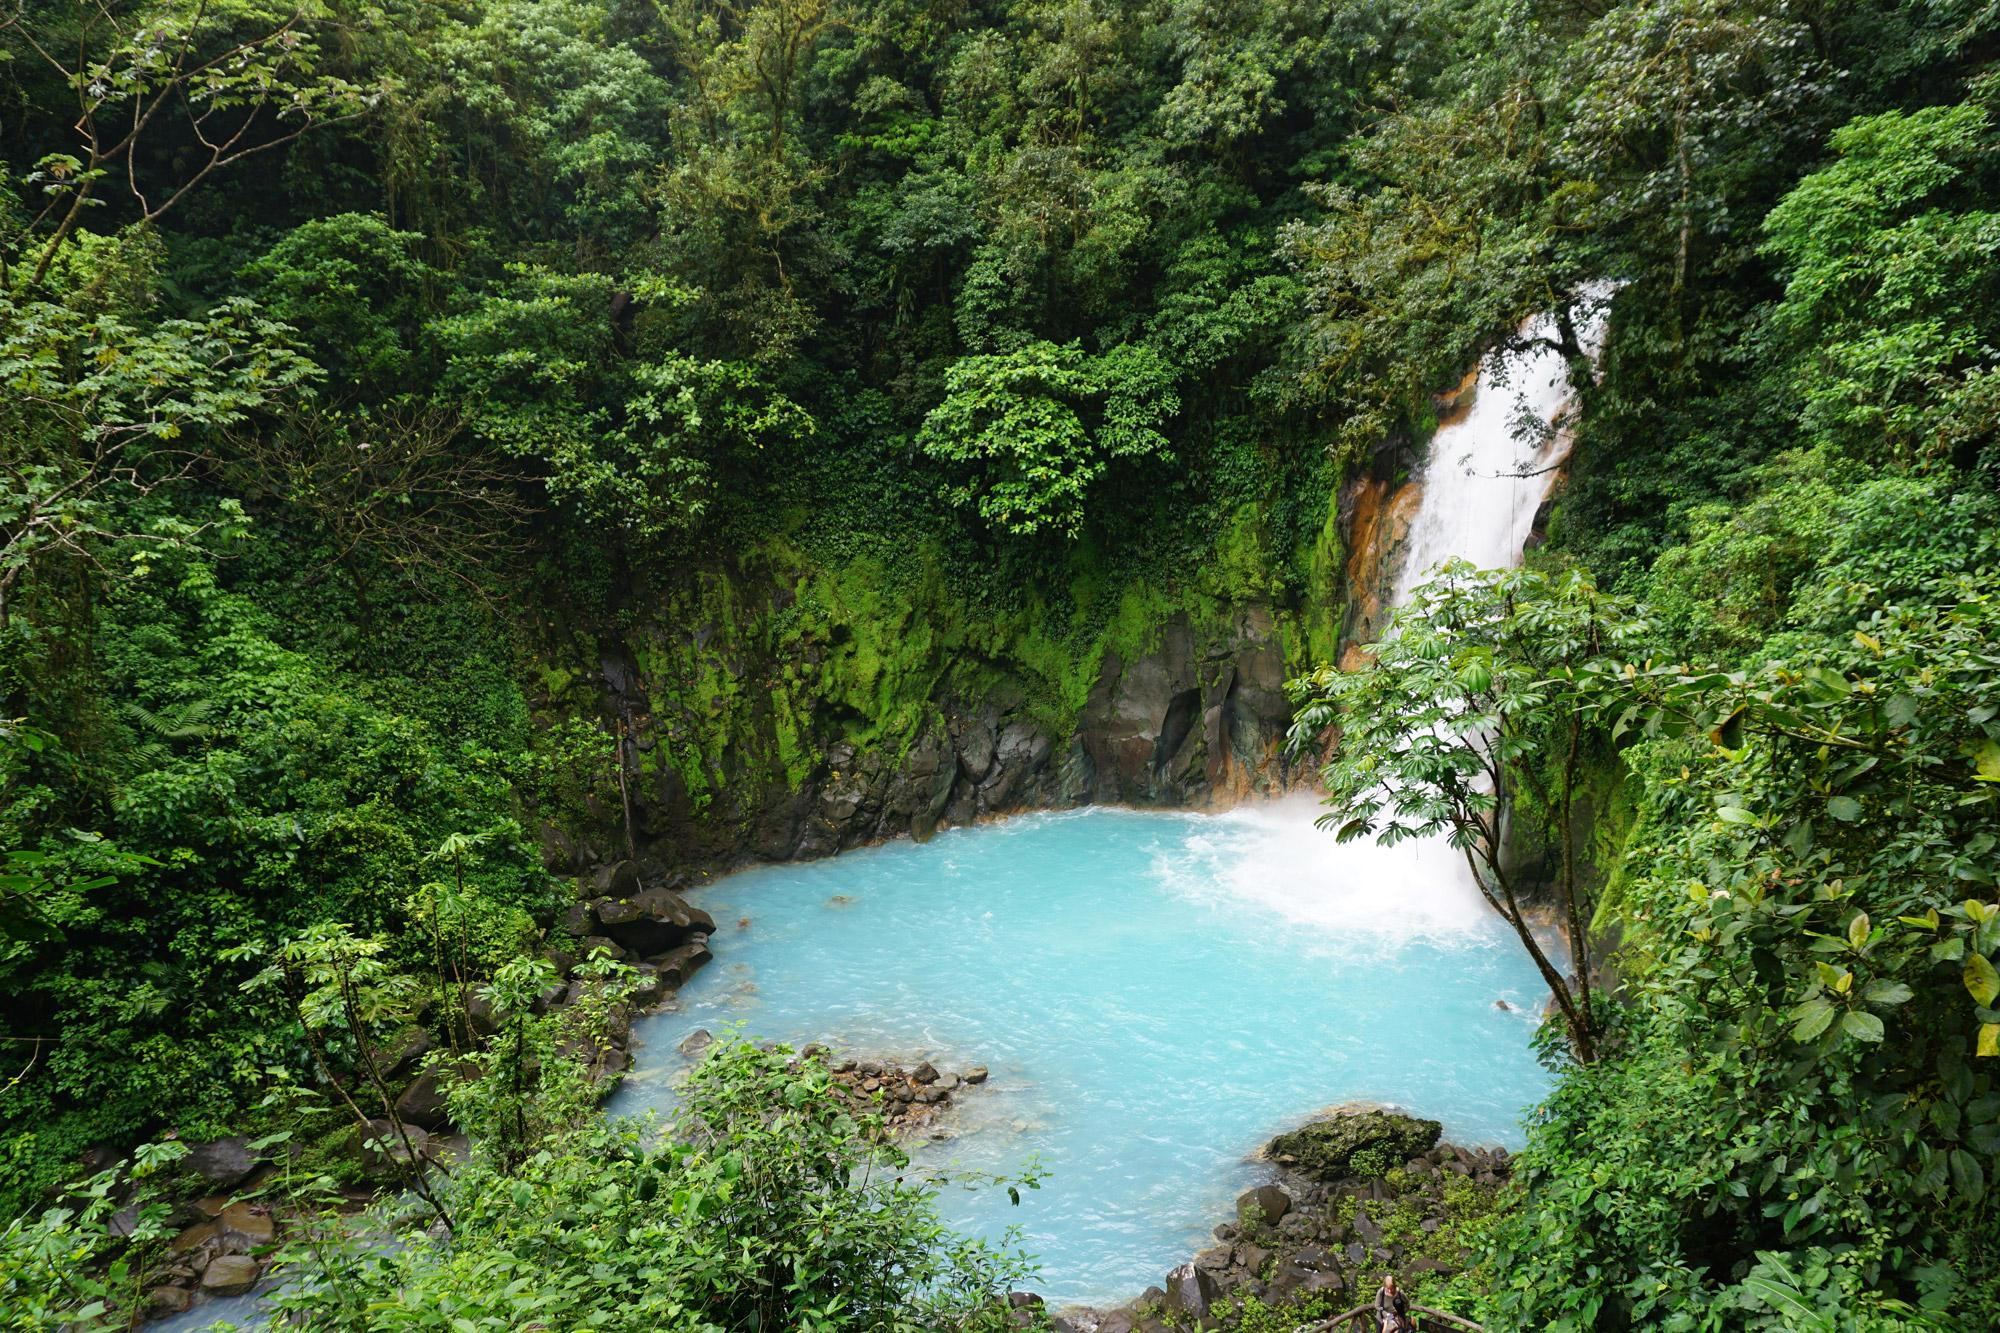 Anouk - Rio Celeste, Costa Rica